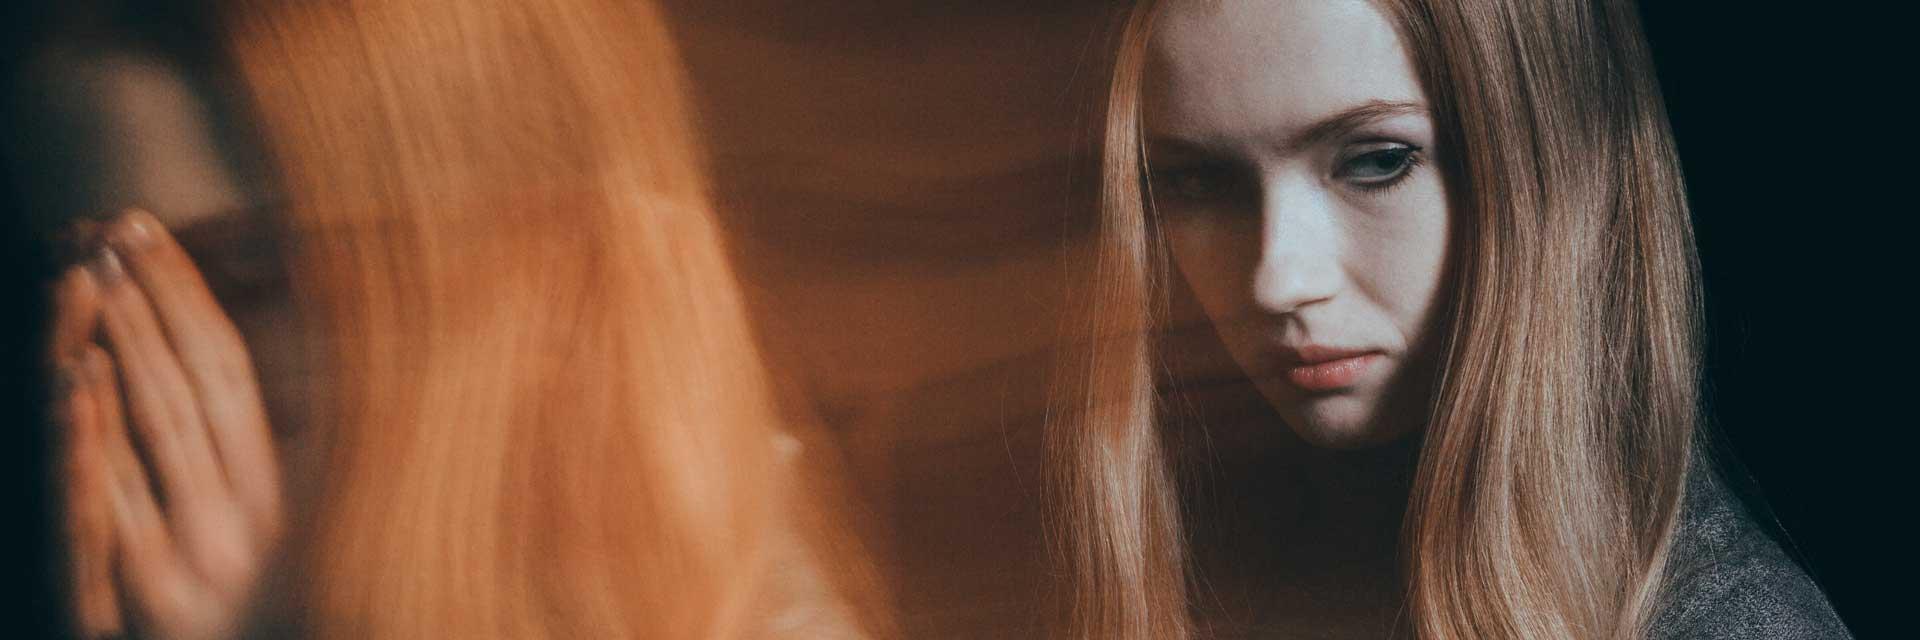 attacchi d'ansia, ansia sintomi, significato ansia, sintomi